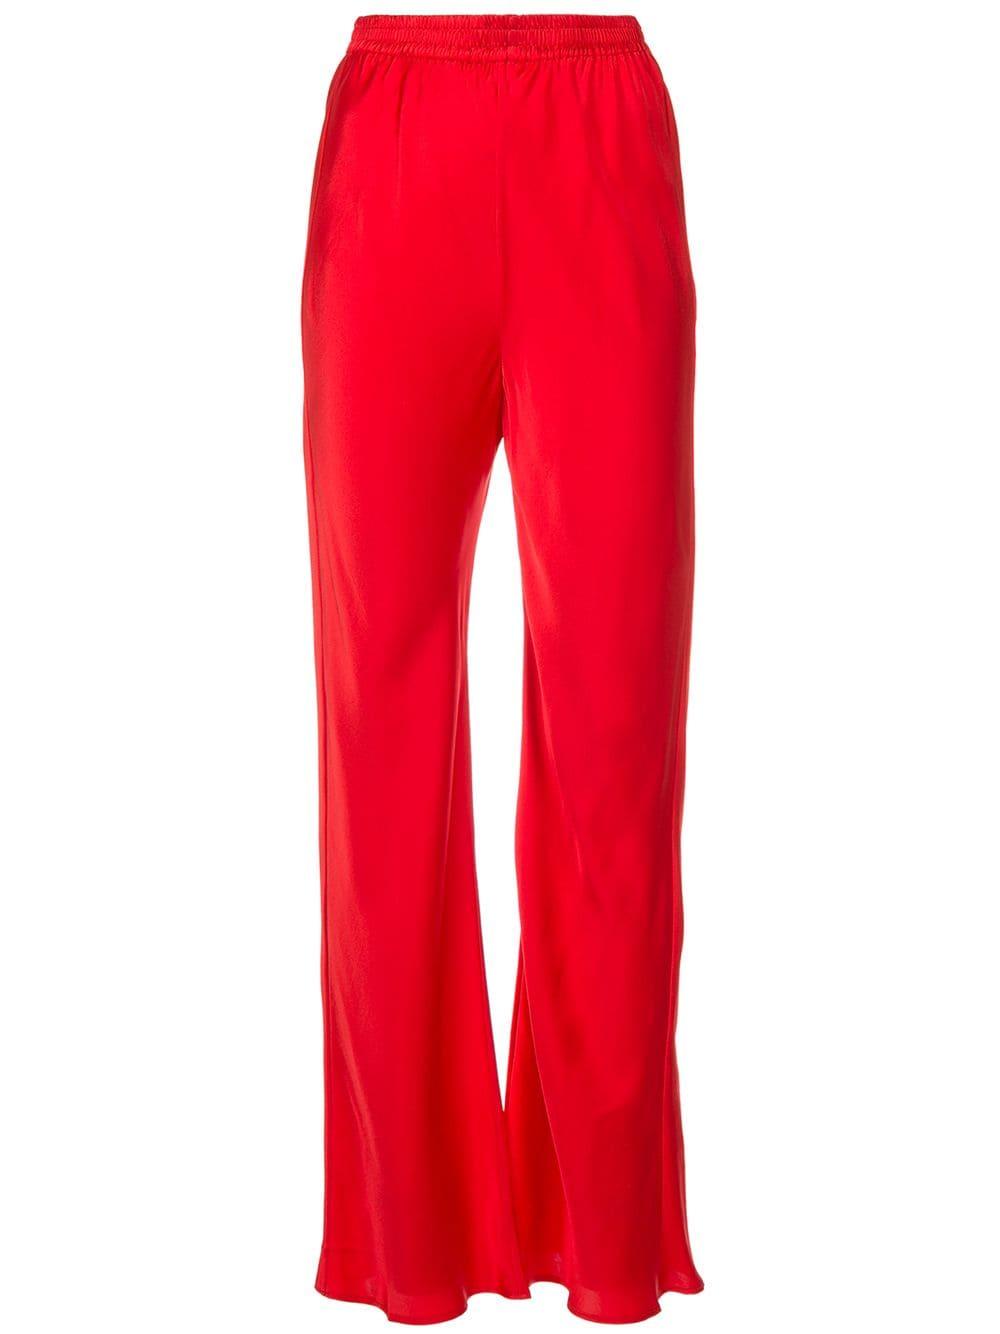 98137e9f265 Michael Lo Sordo flared high waisted trousers - Glami.cz